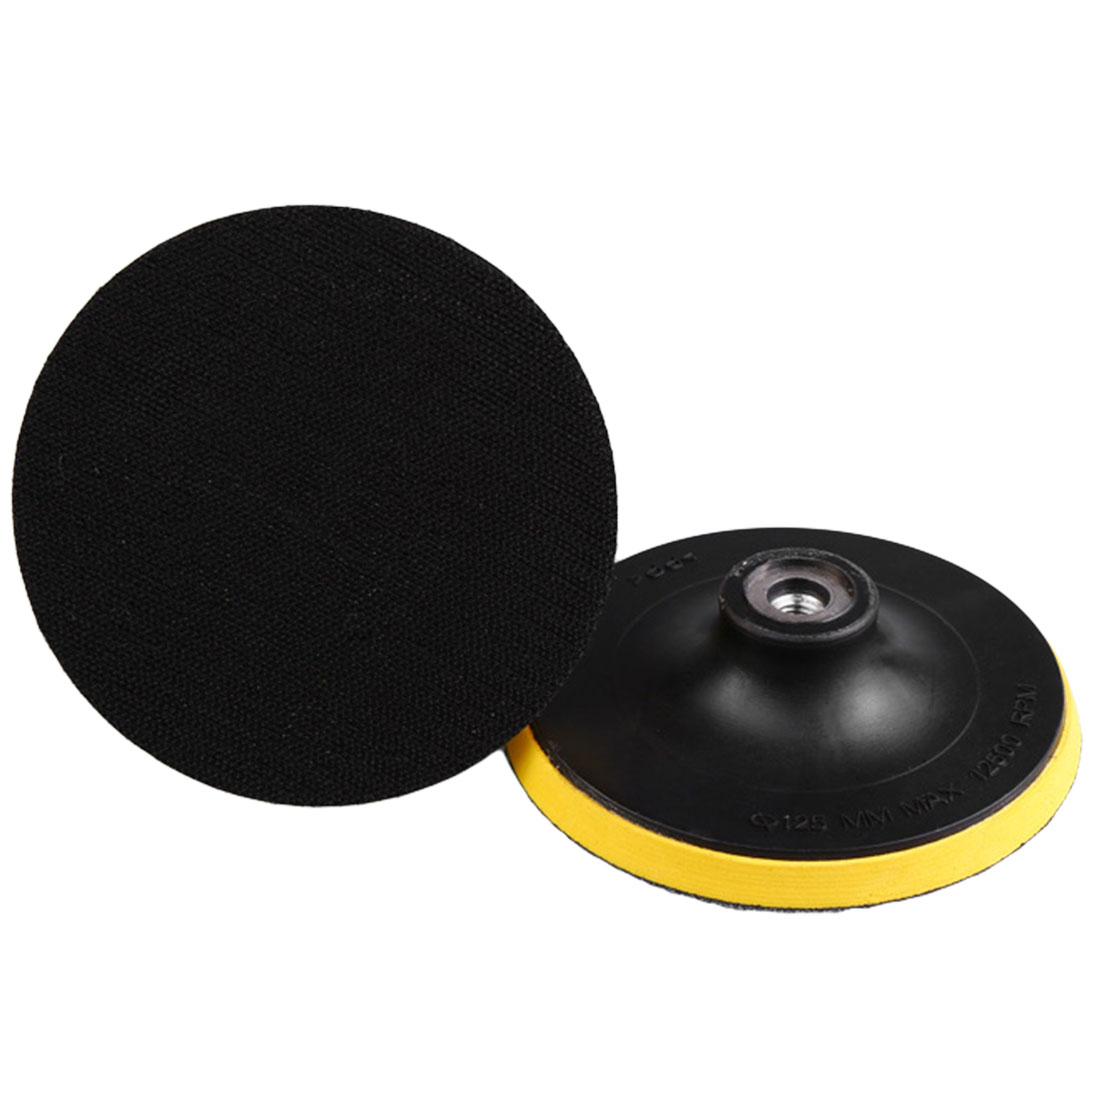 Self-adhesive Sand Paper Pad Sander Disc Disk Sandpaper For Electric Grinder Polisher Machine Polishing Disc Abrasive Tool